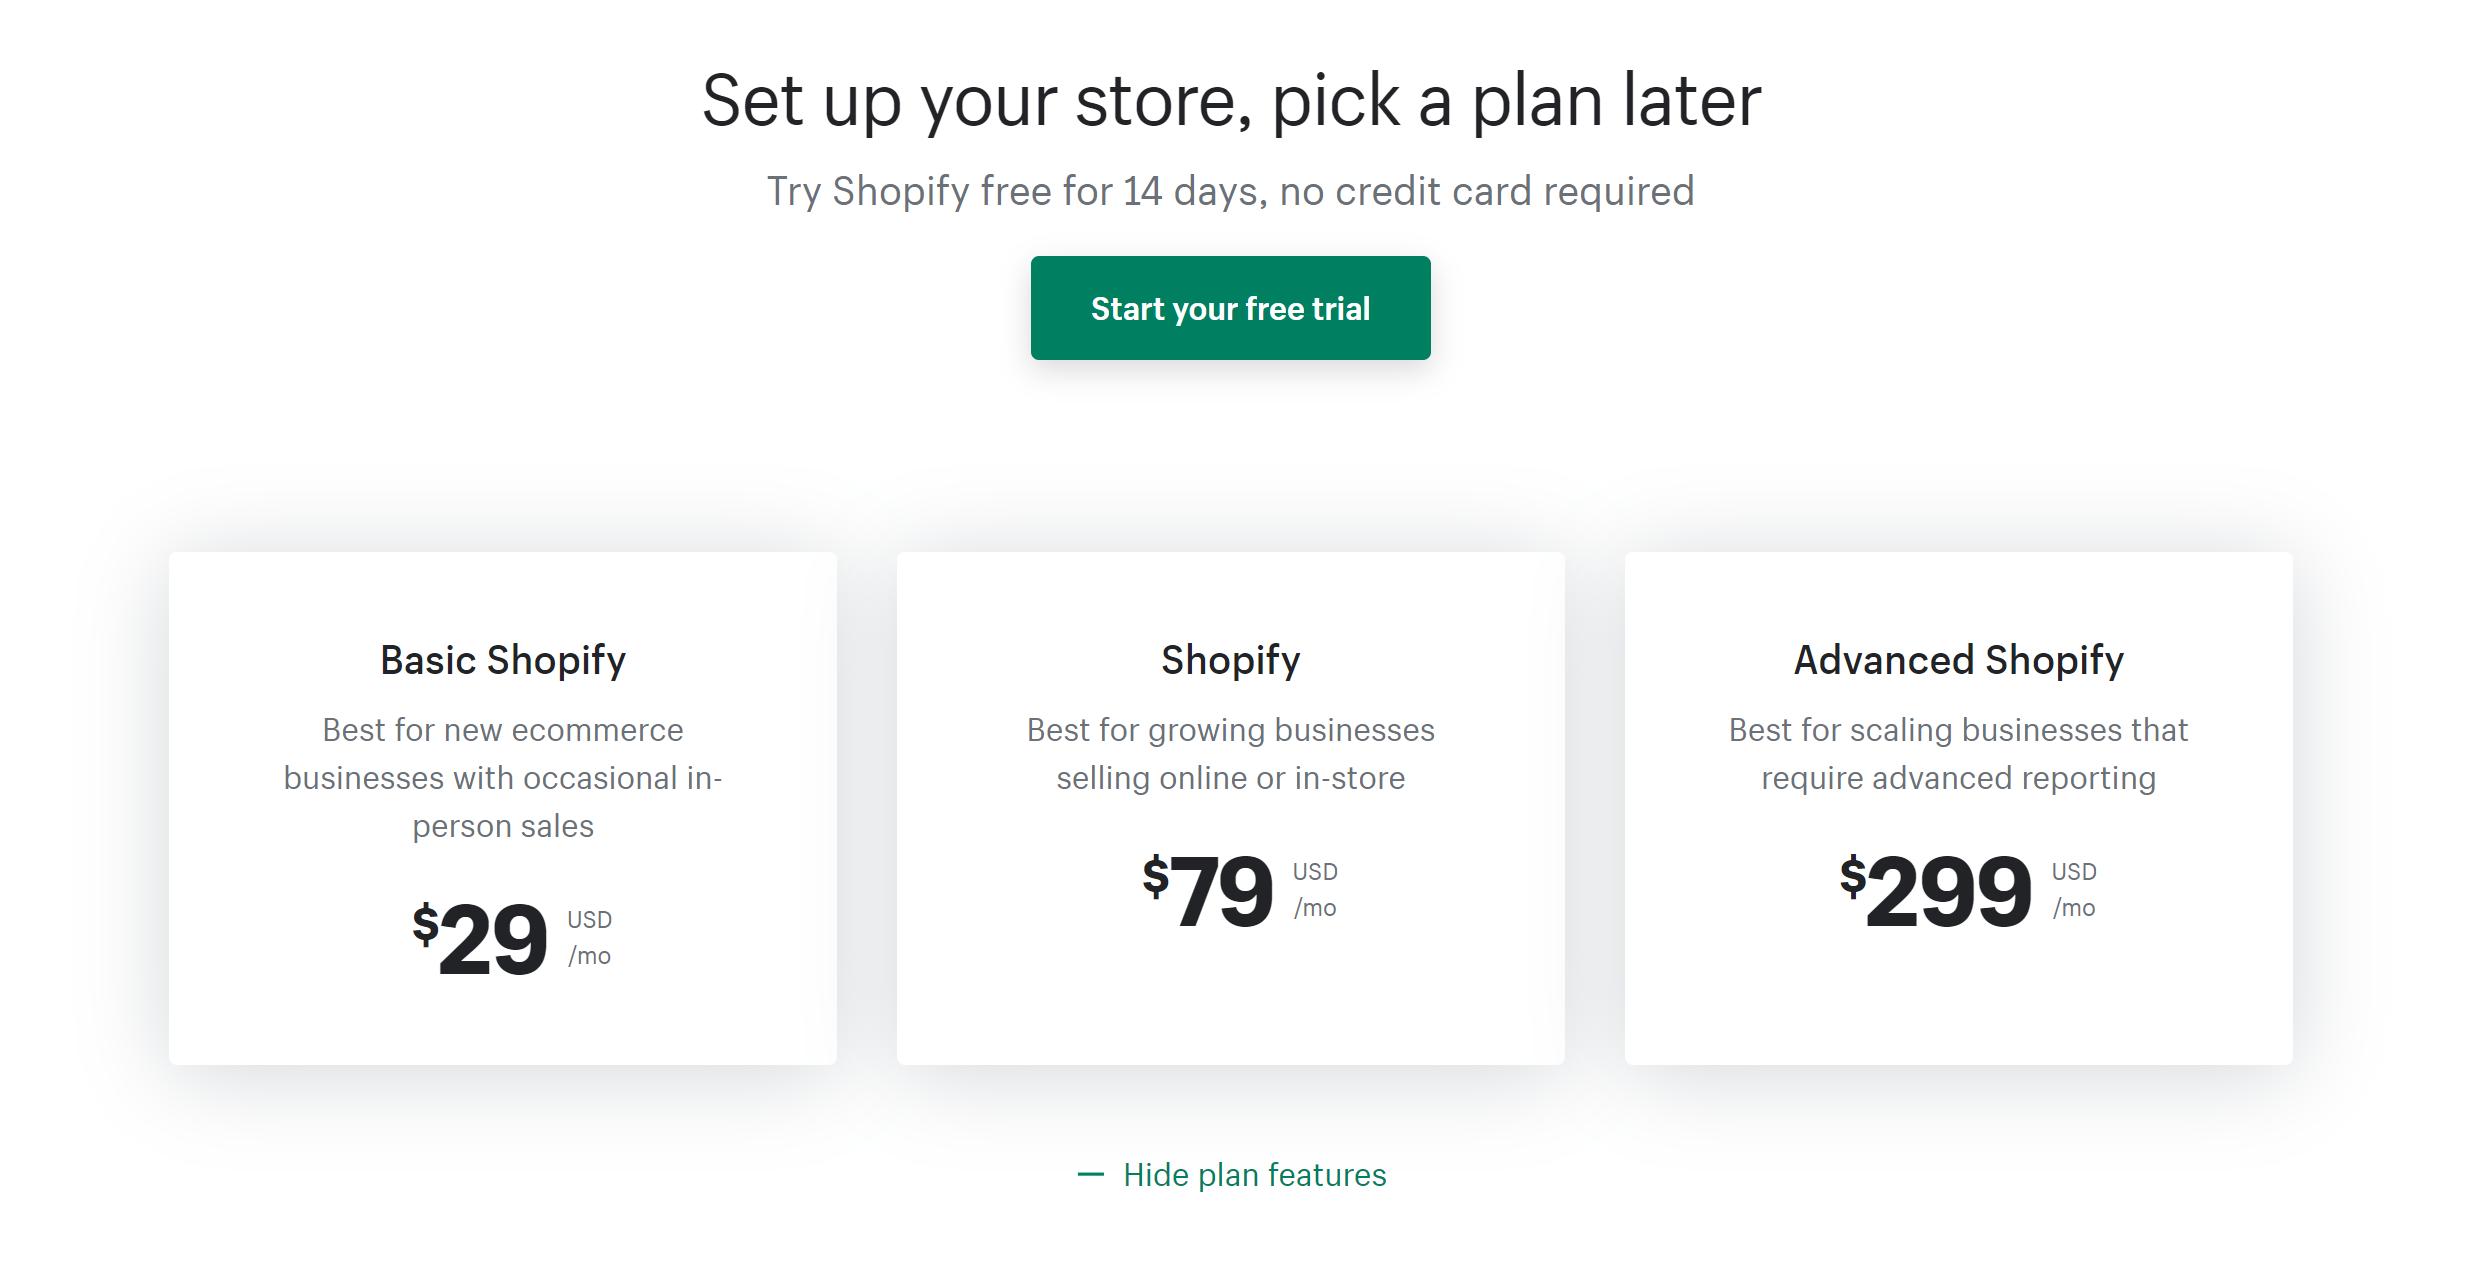 ShopifySS